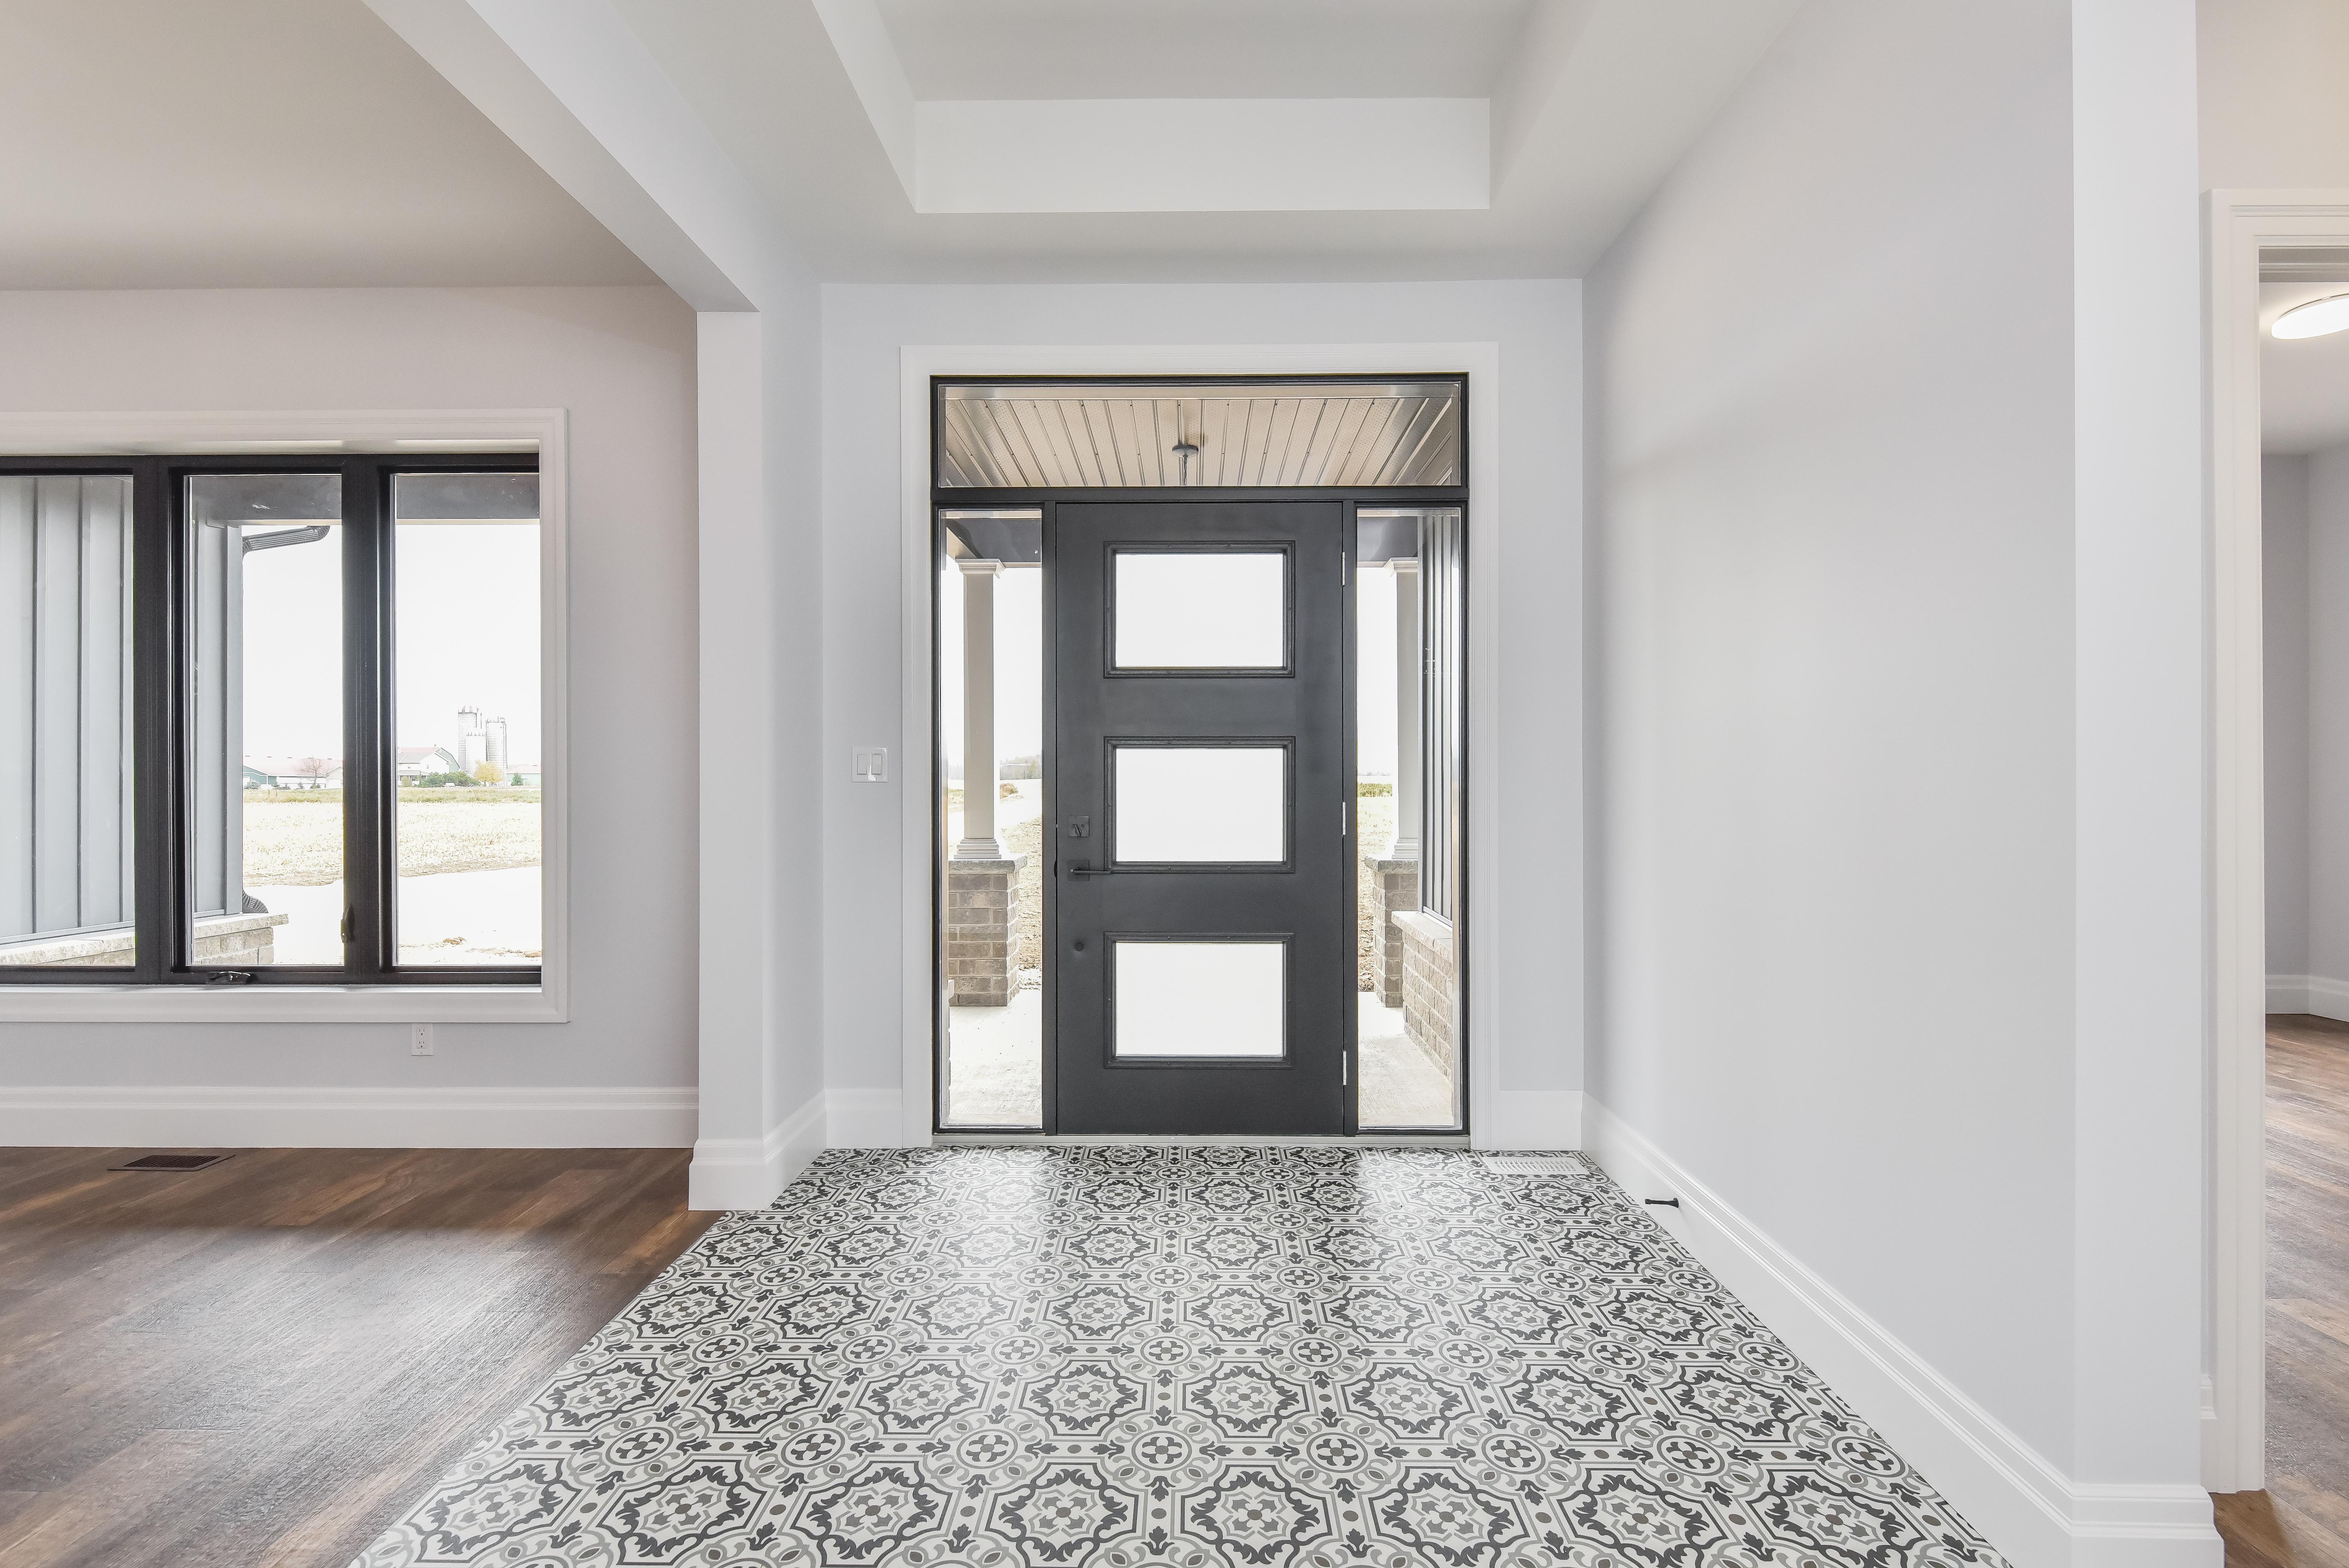 Front Entry Door Styles That Were Most Popular In 2019 Golden Windows